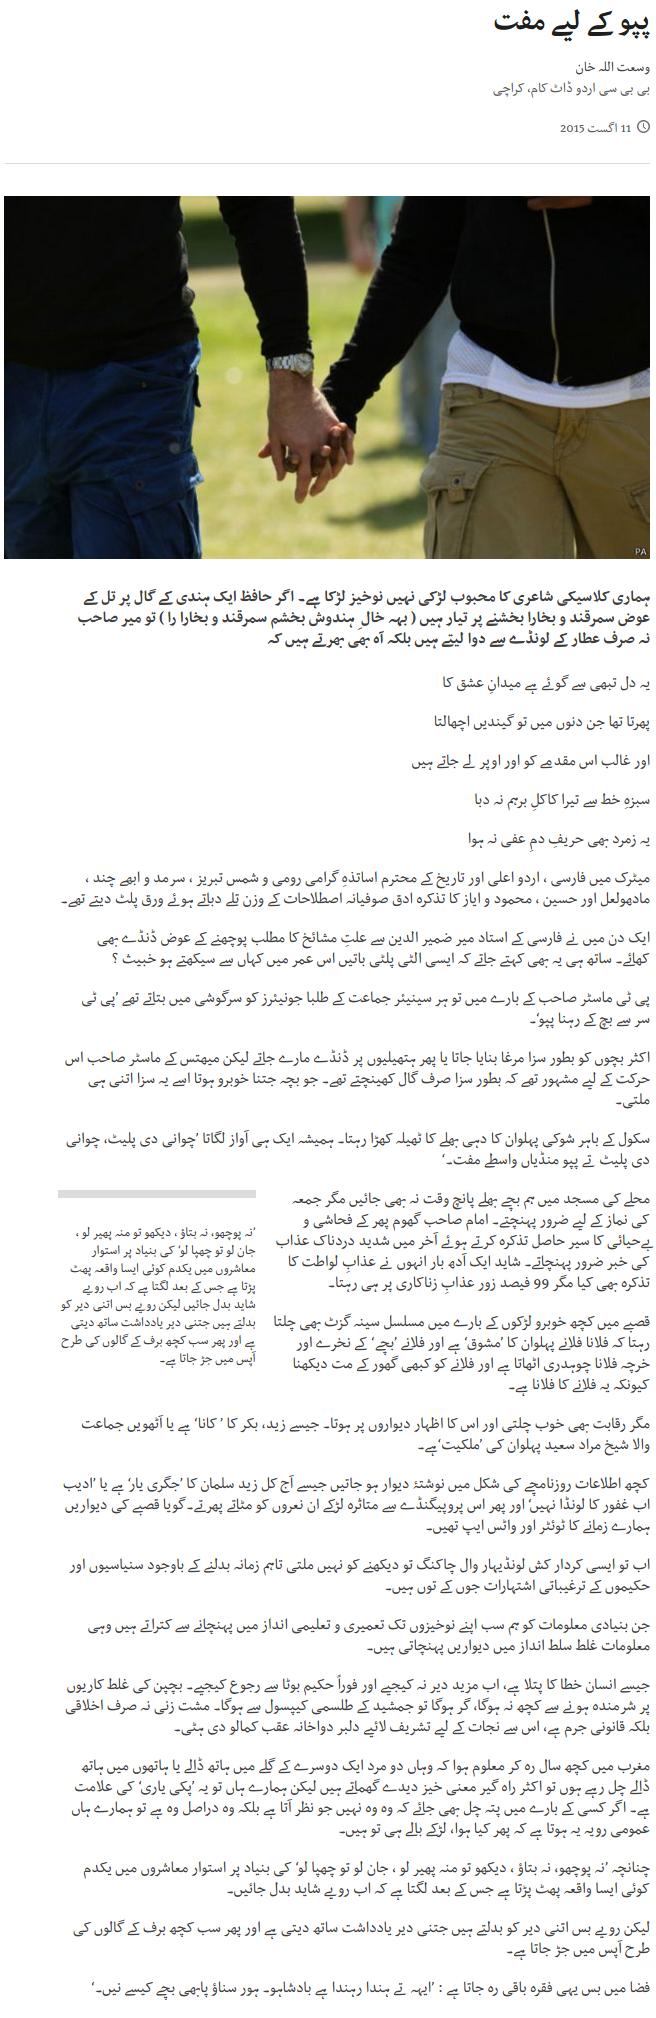 Wusatullah Khan Column | Papu Kay Leye Muft | Baat Say Baat